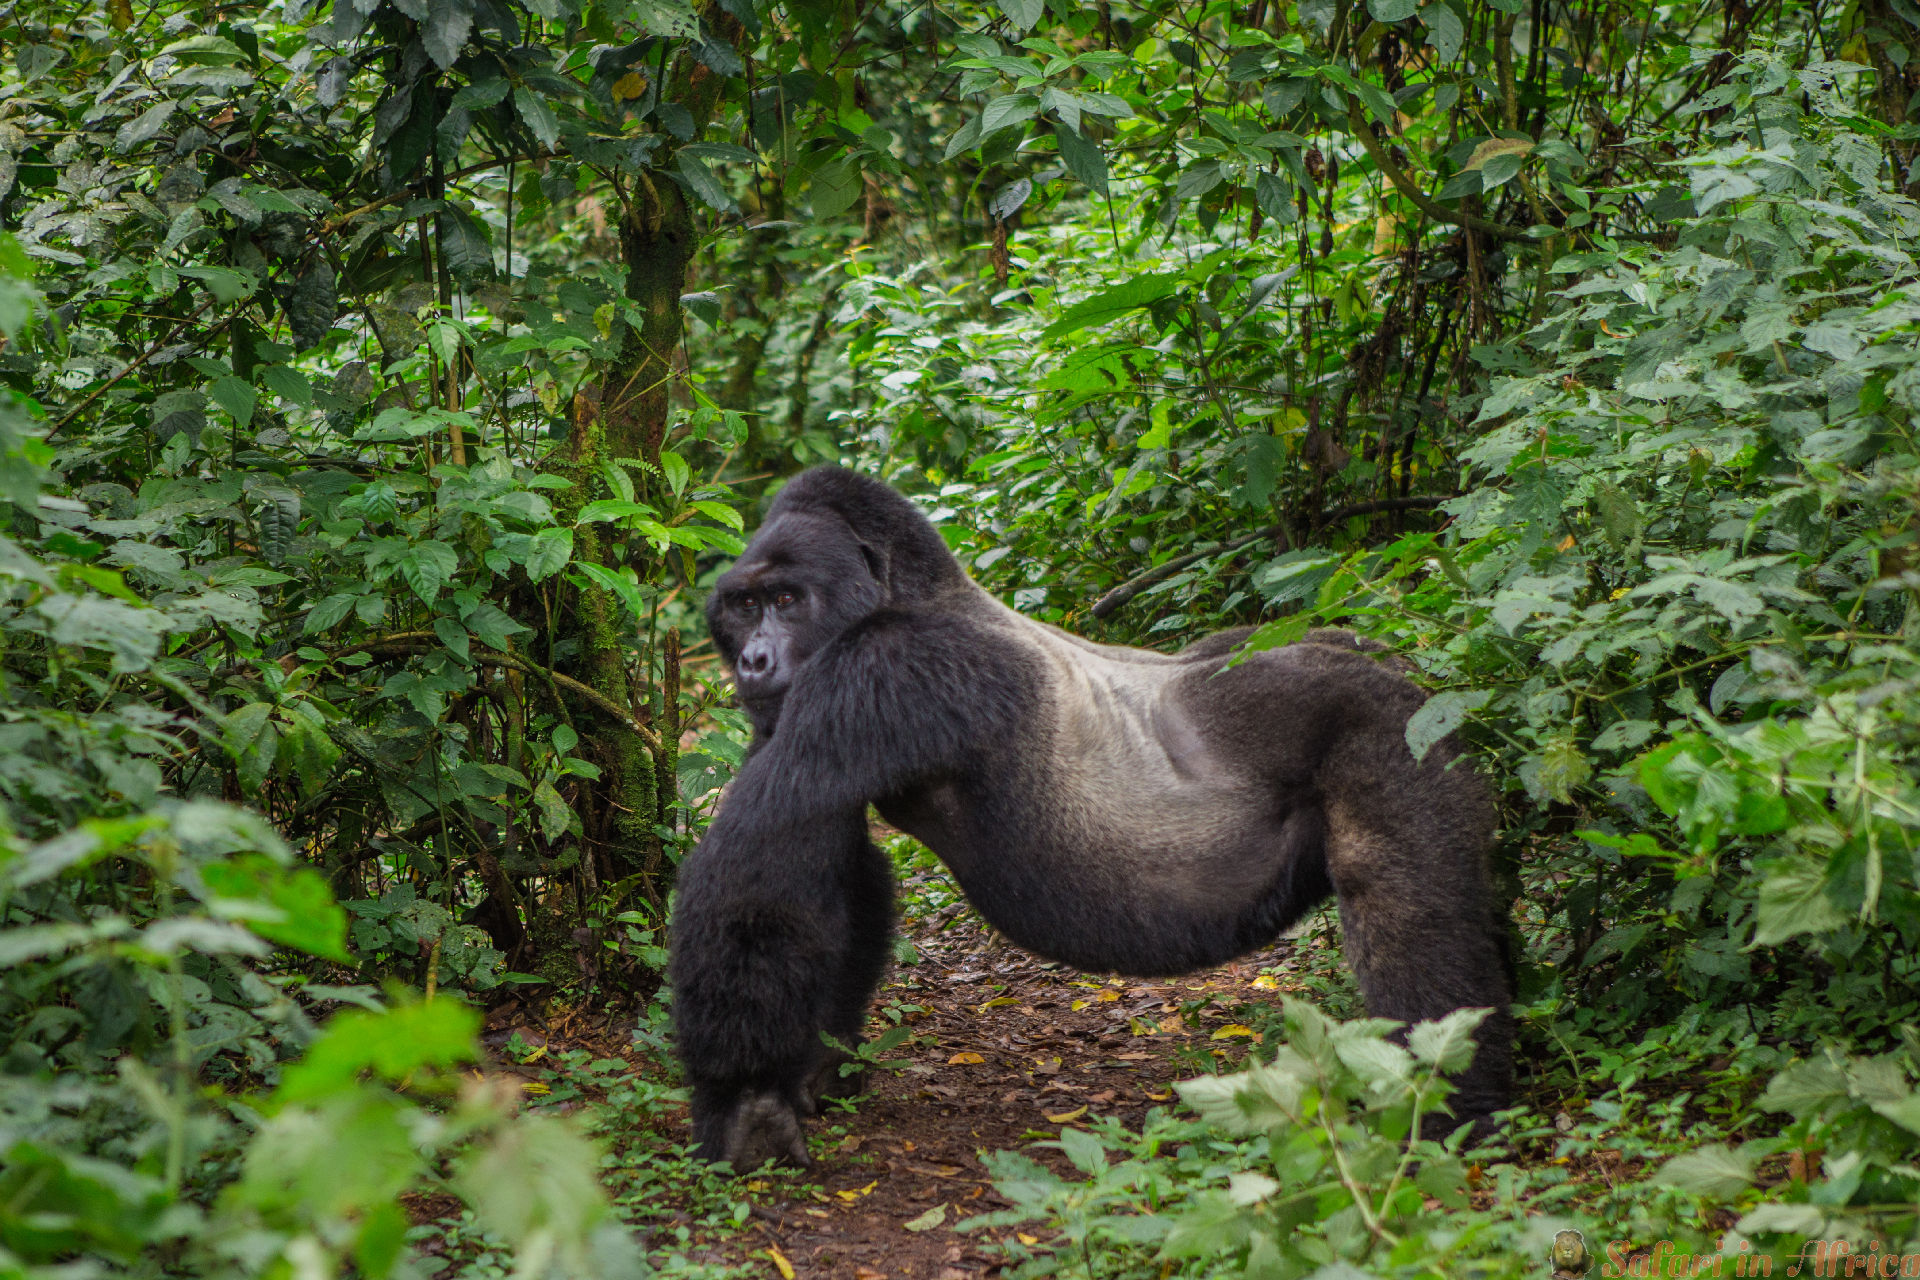 Dominant male mountain gorilla in rainforest. Bwindi Impenetrable Forest National Park, Uganda